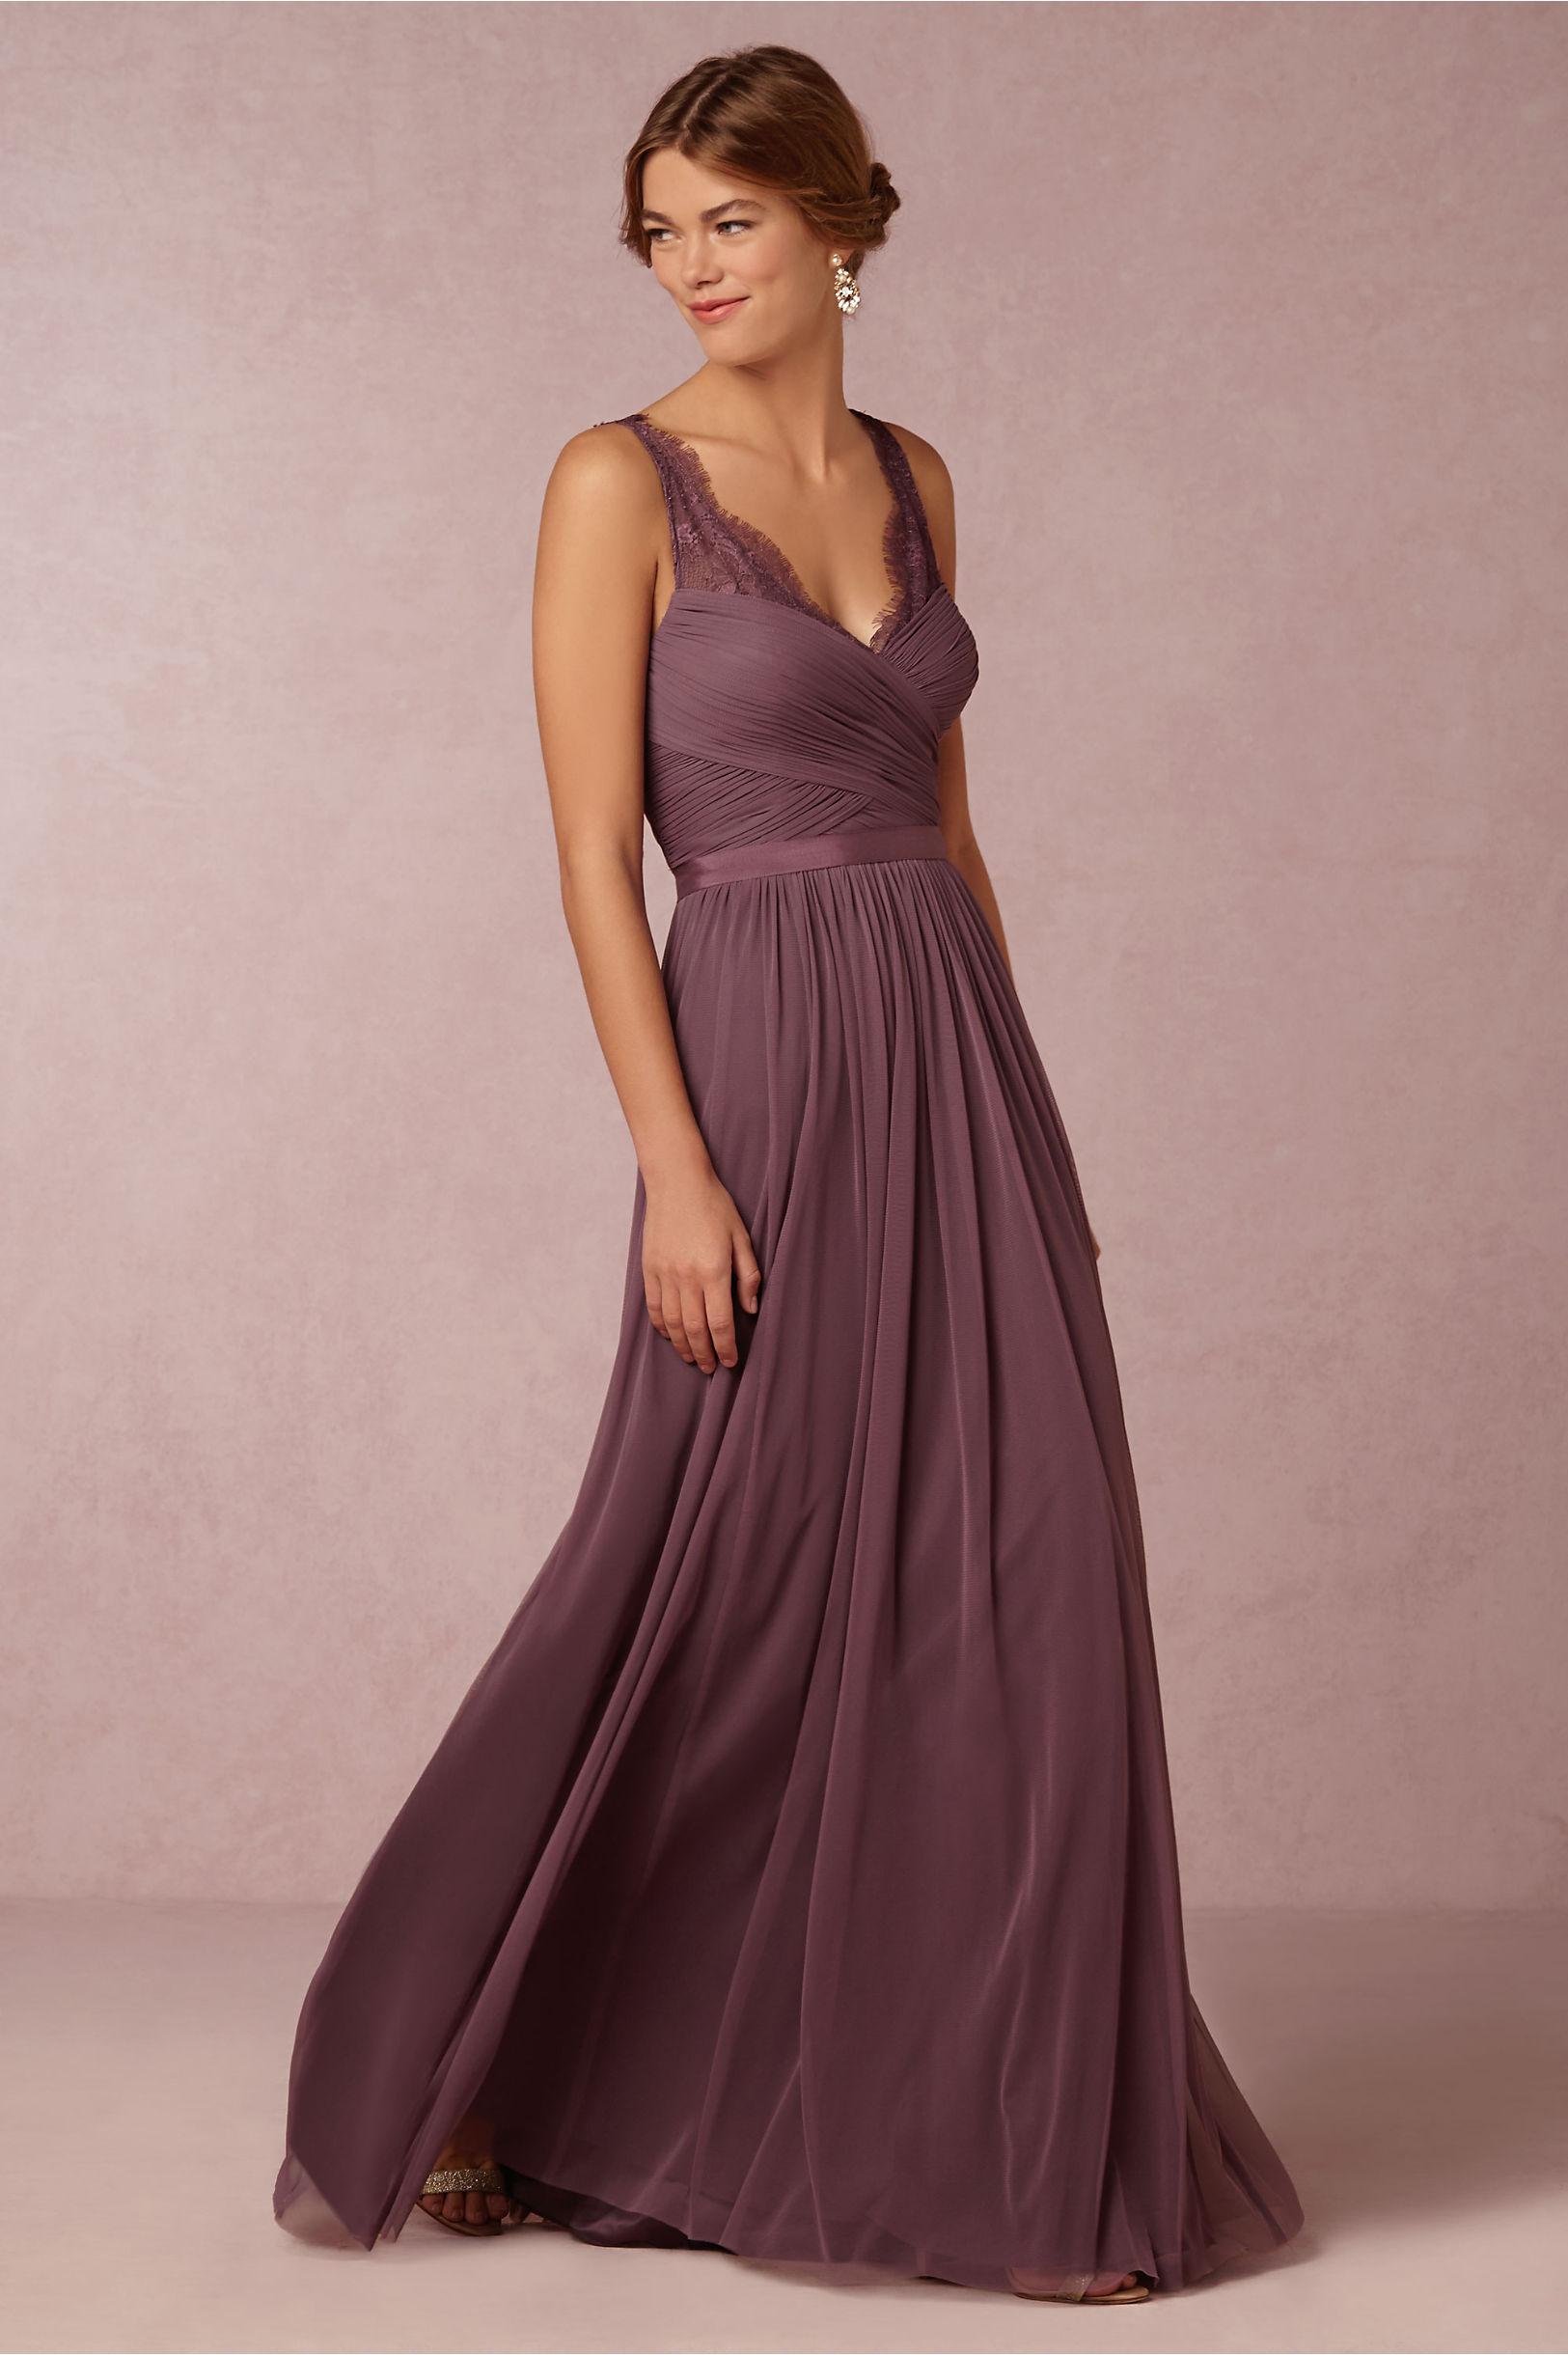 Chiffon Purple elegant long bridesmaid dress